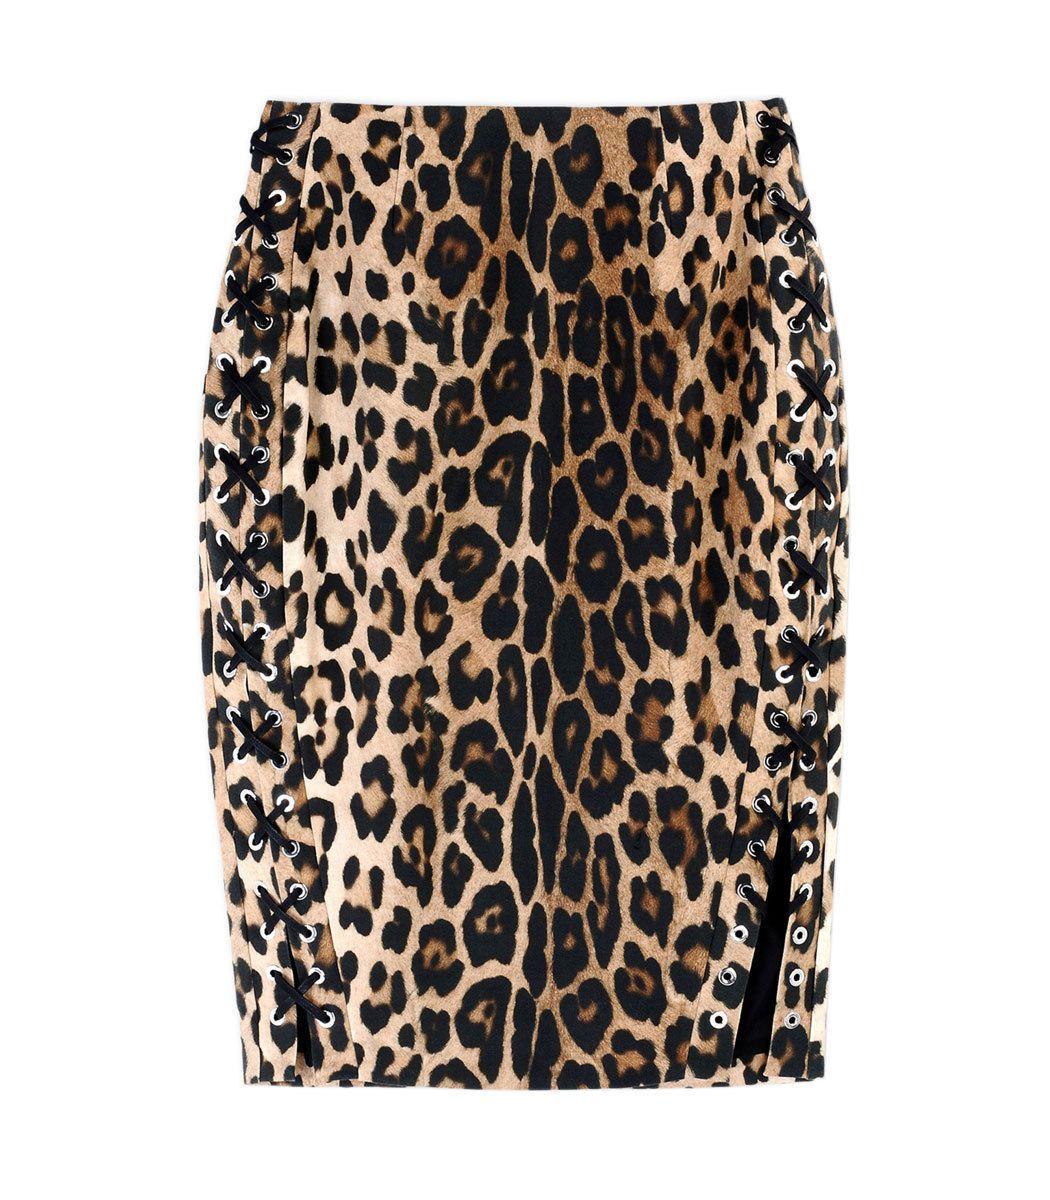 Altuzarra Fawn Leopard-Printed Pencil Skirt